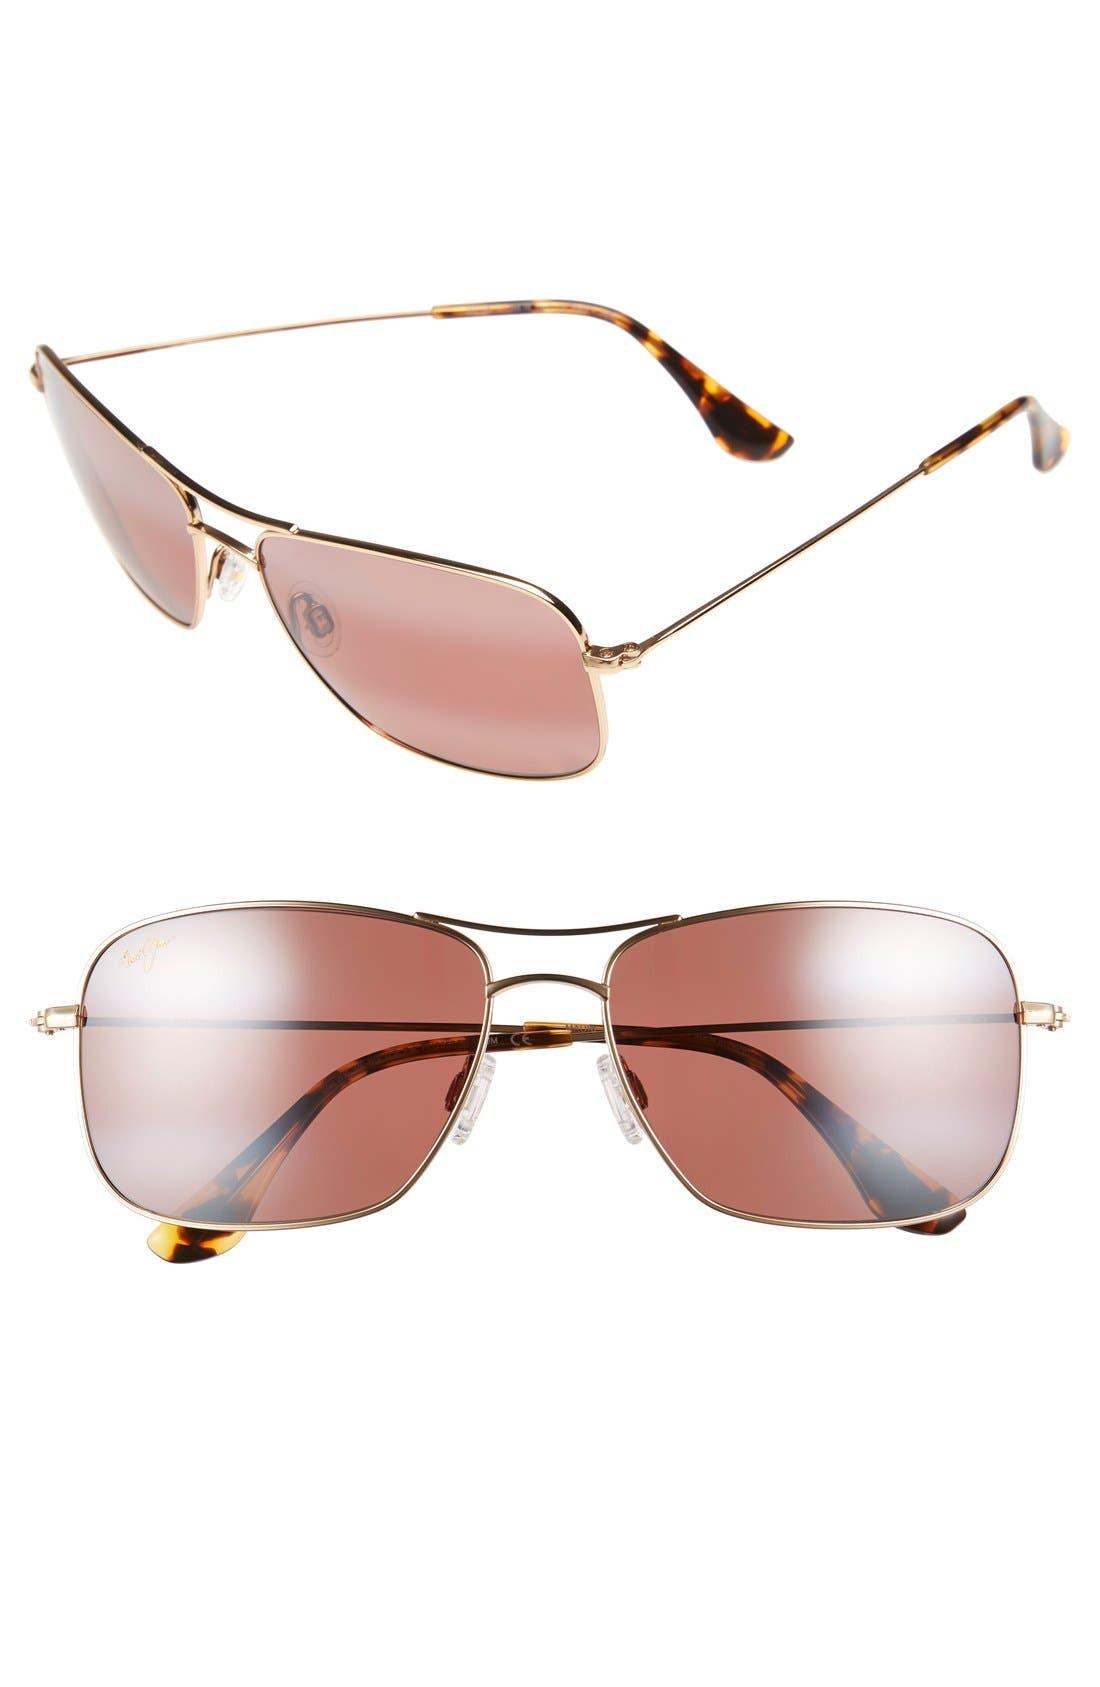 Maui Jim Wiki Wiki 5m Polarizedplus2 Sunglasses -